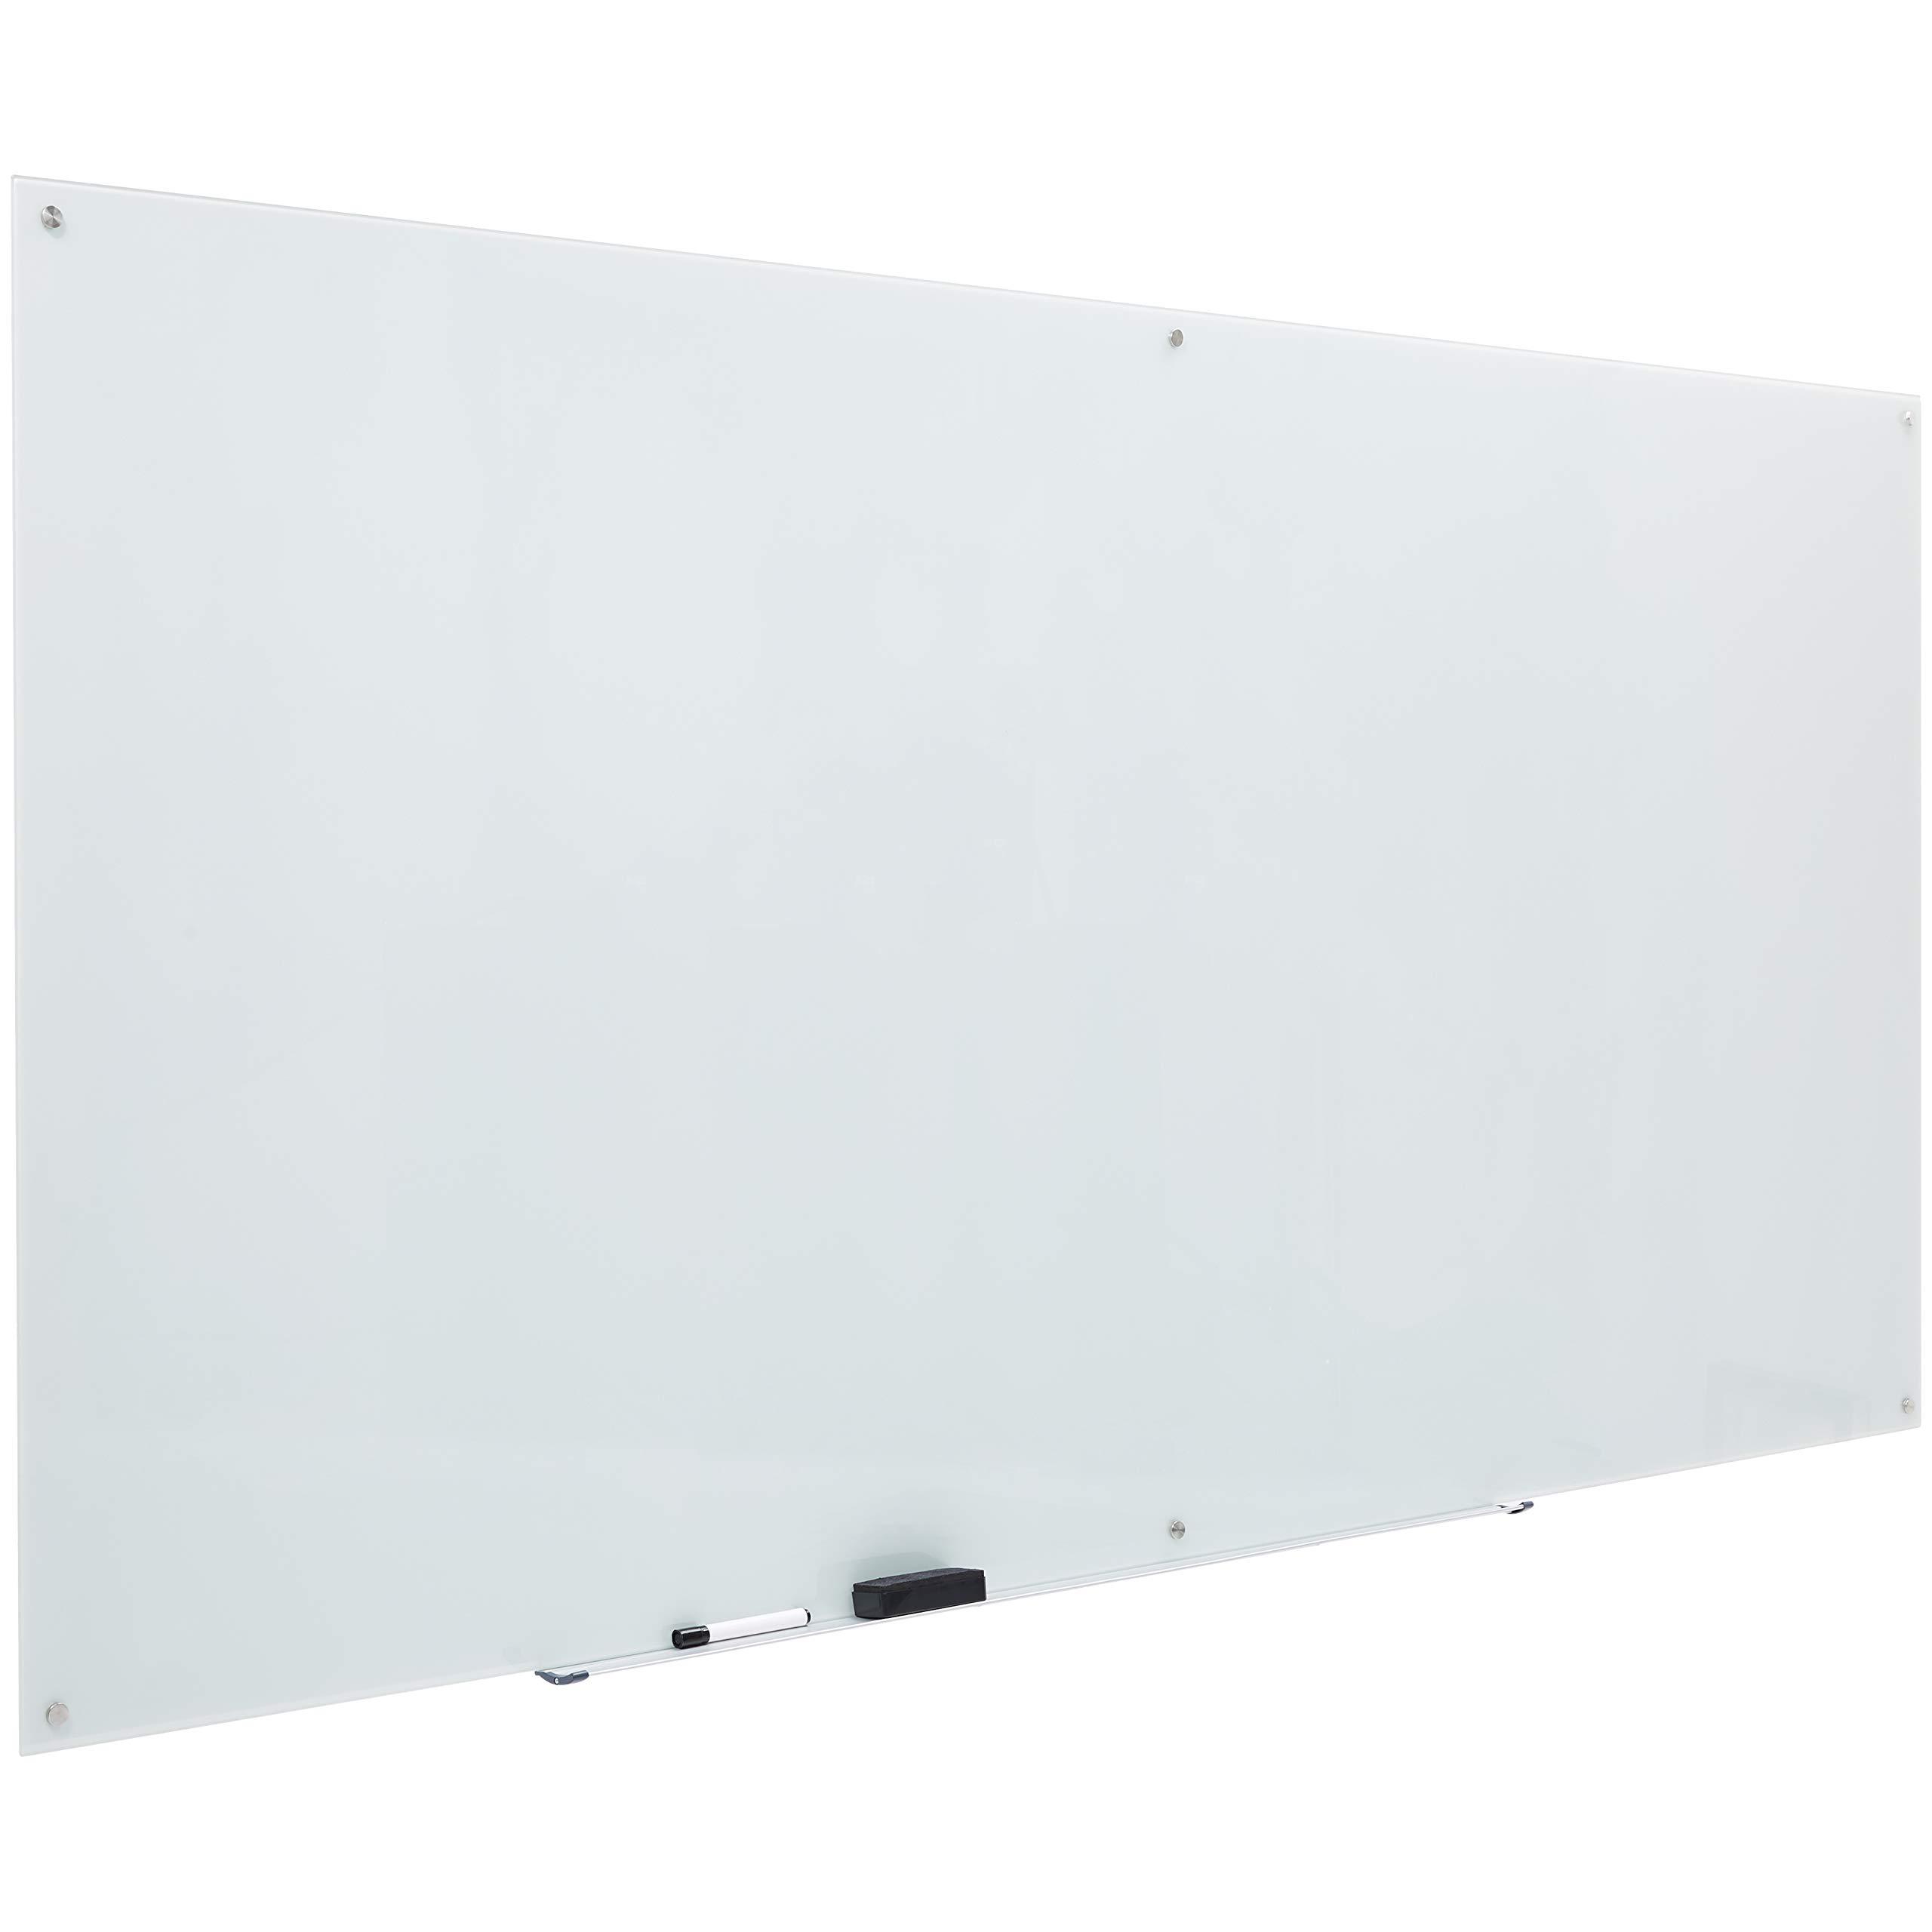 AmazonBasics Glass Dry-Erase Board - White, Magnetic, 8 Feet x 4 Feet by AmazonBasics